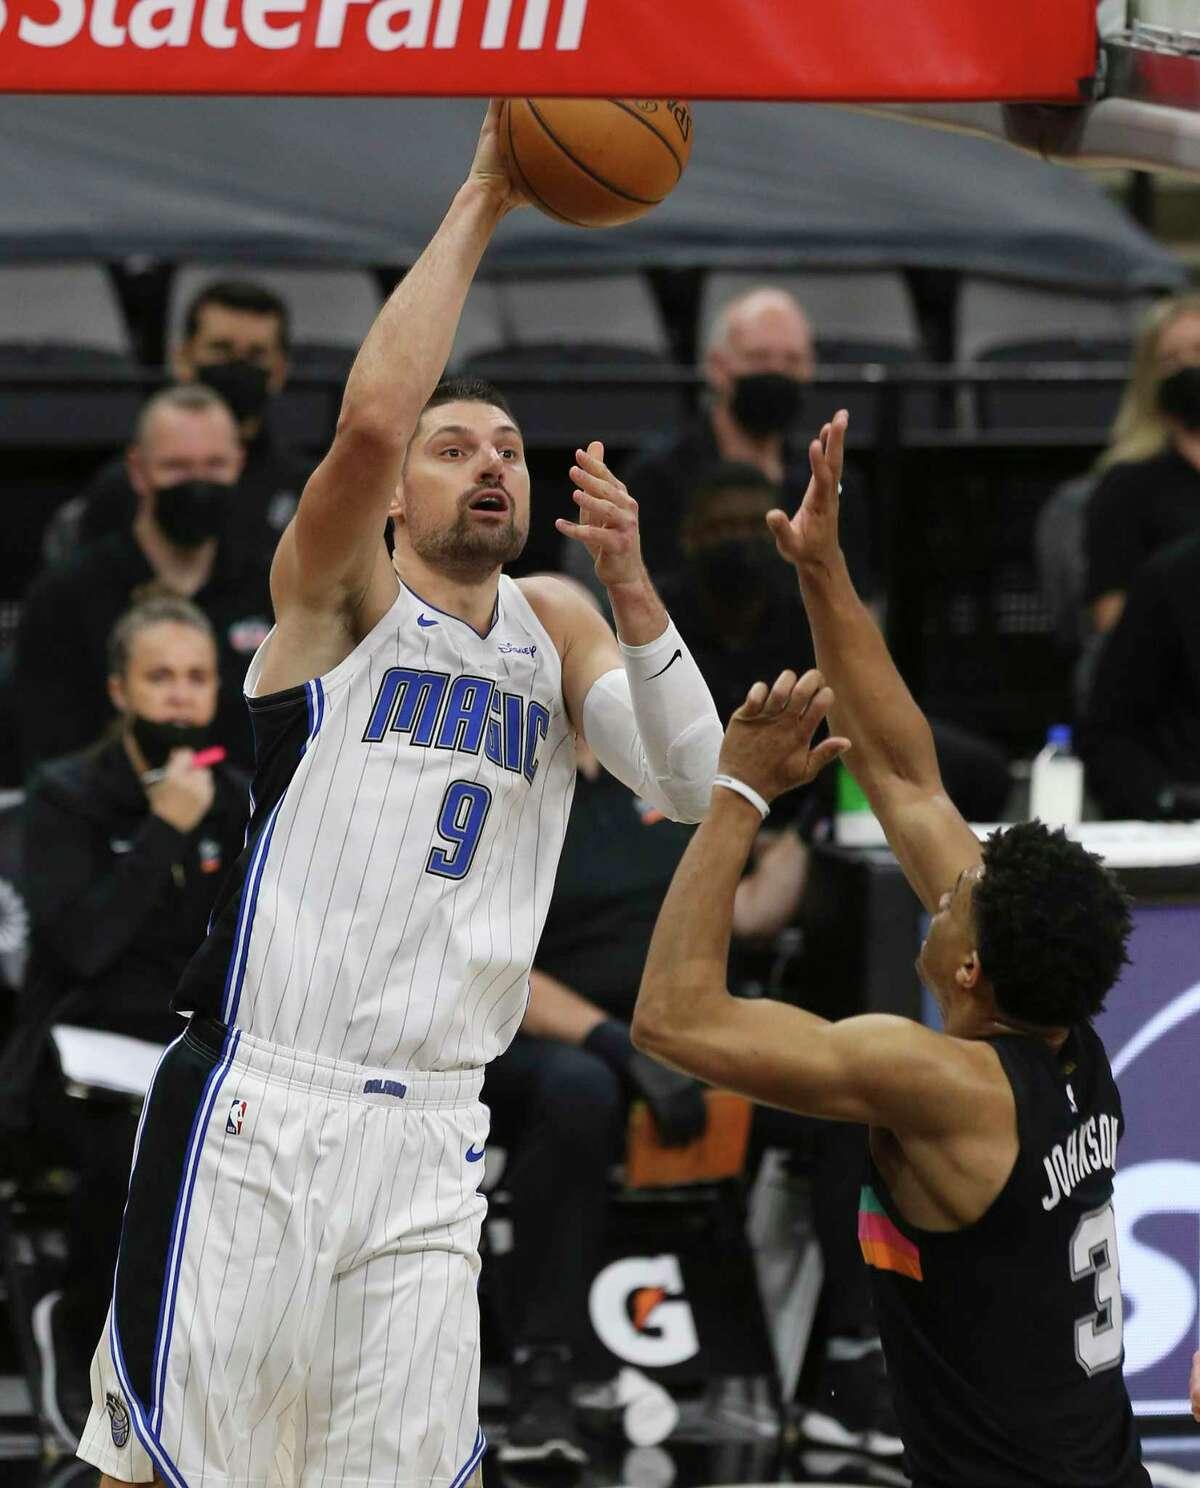 Orlando Magic's Nikola Vucevic (09) scores against Spurs' Keldon Johnson (03) at the AT&T Center on Friday, Mar. 12, 2021.